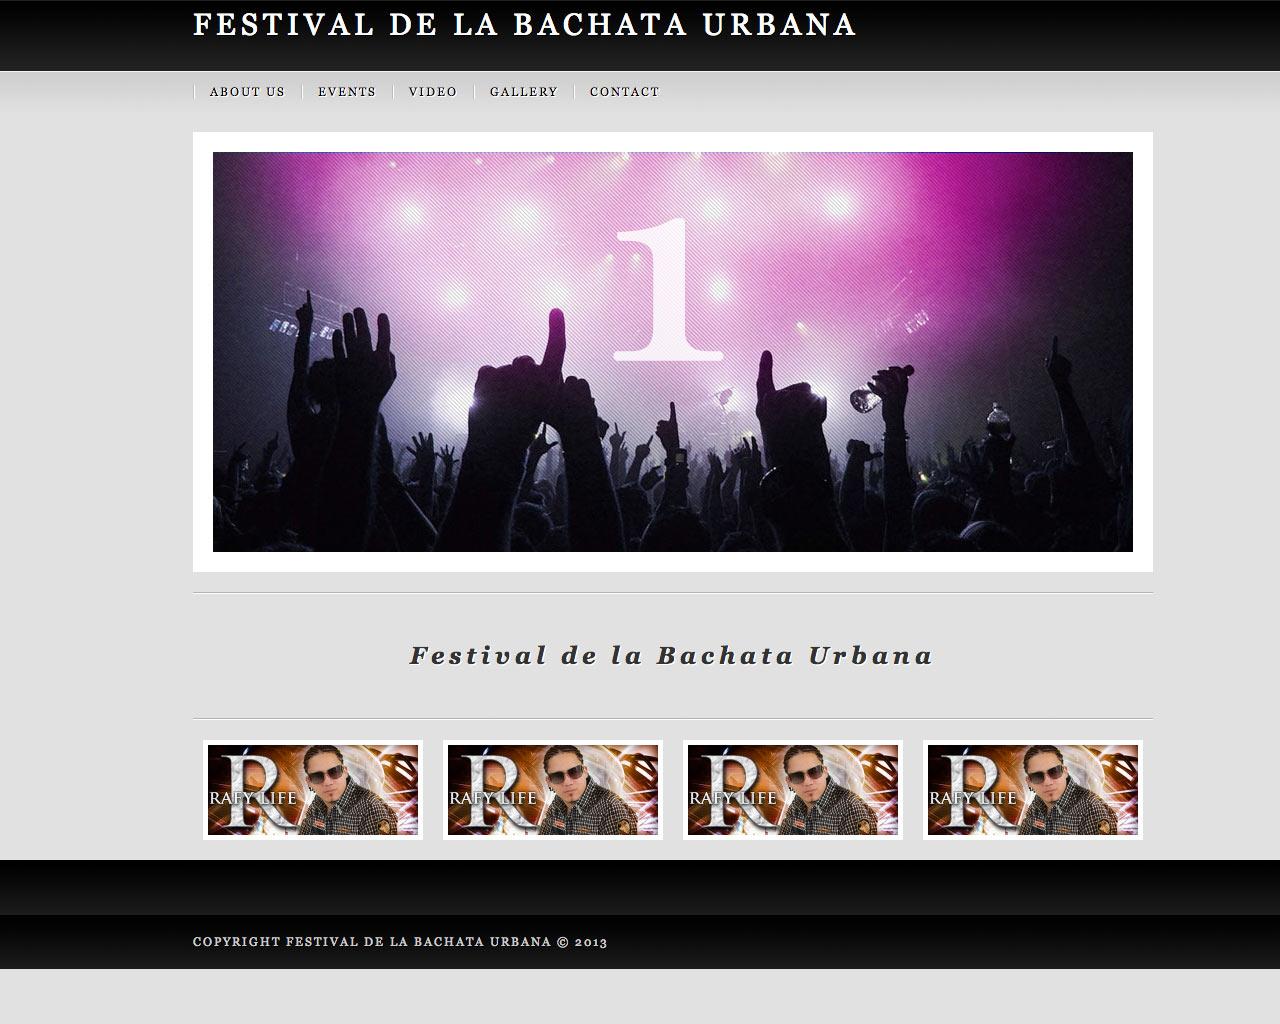 FestivaldelaBachataUrbana